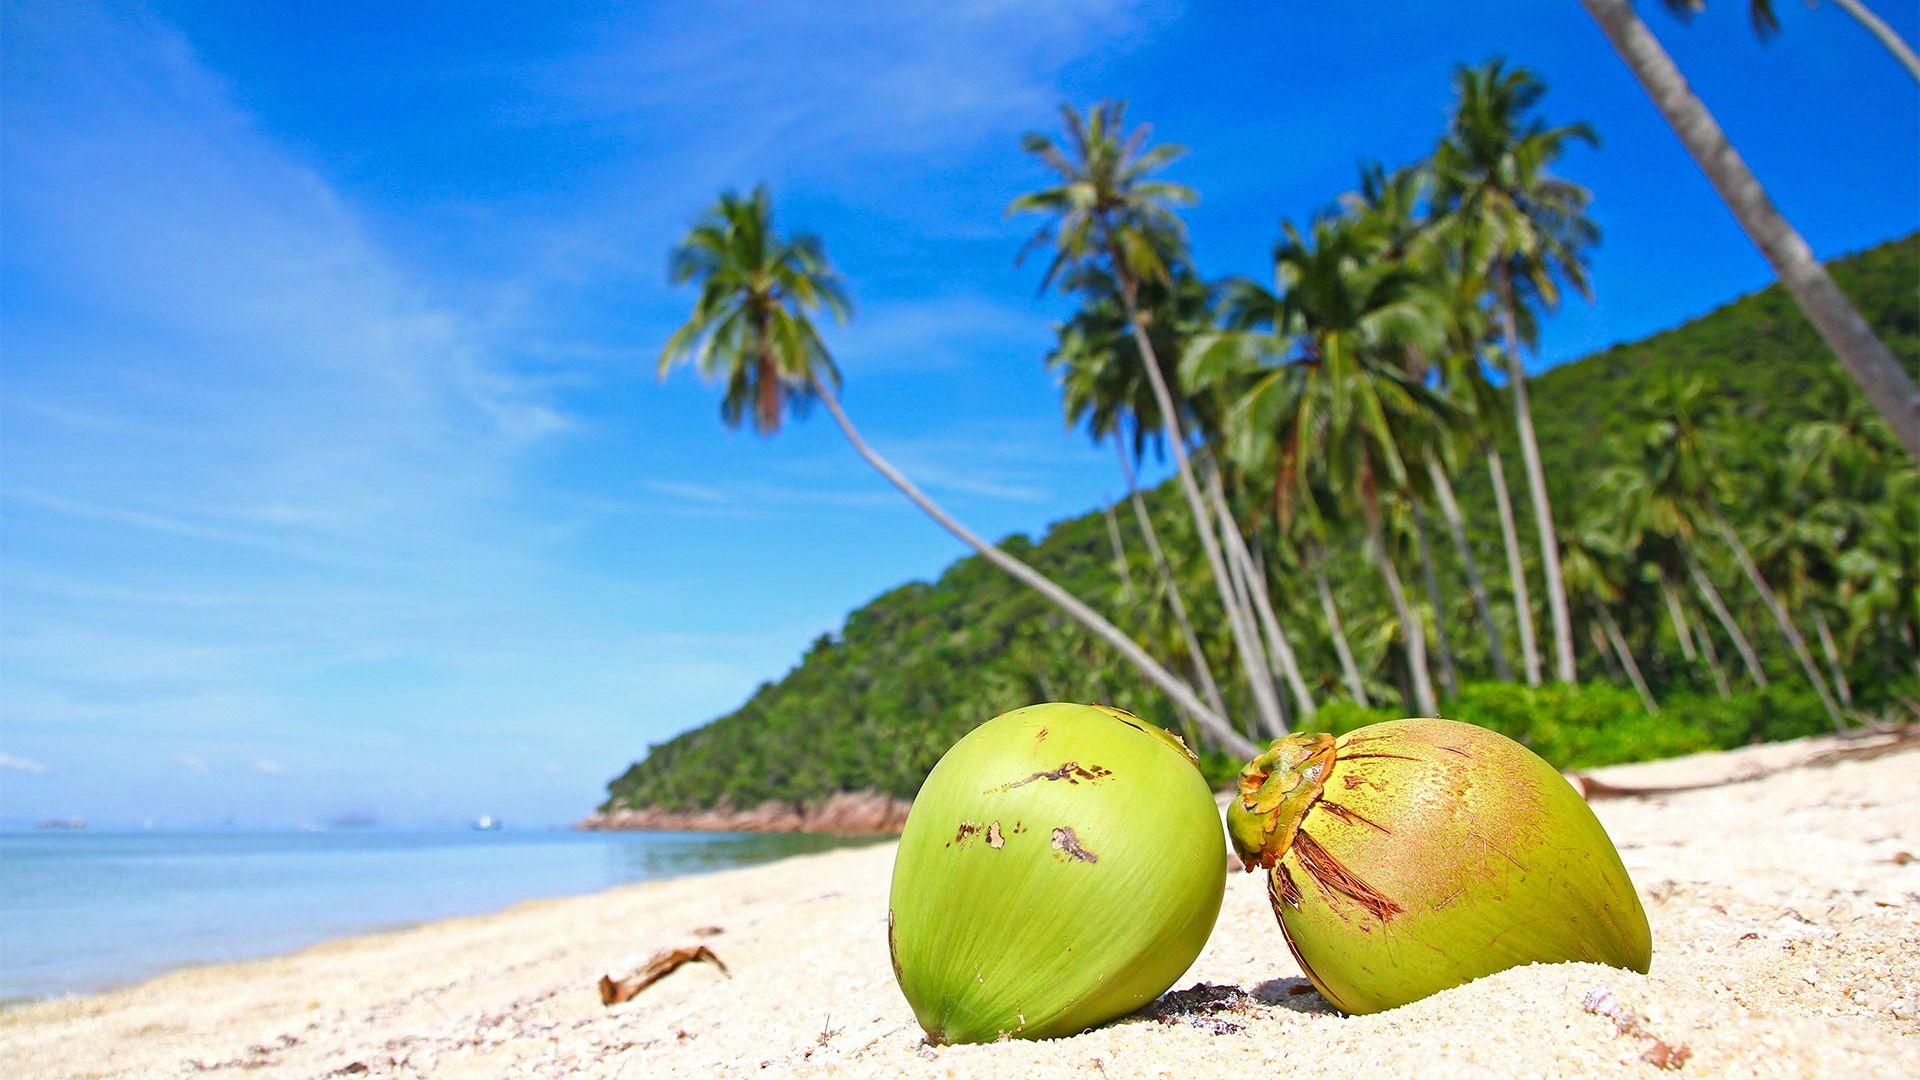 Sejur plaja Punta Cana, Republica Dominicana, 9 zile - 17 noiembrie 2021